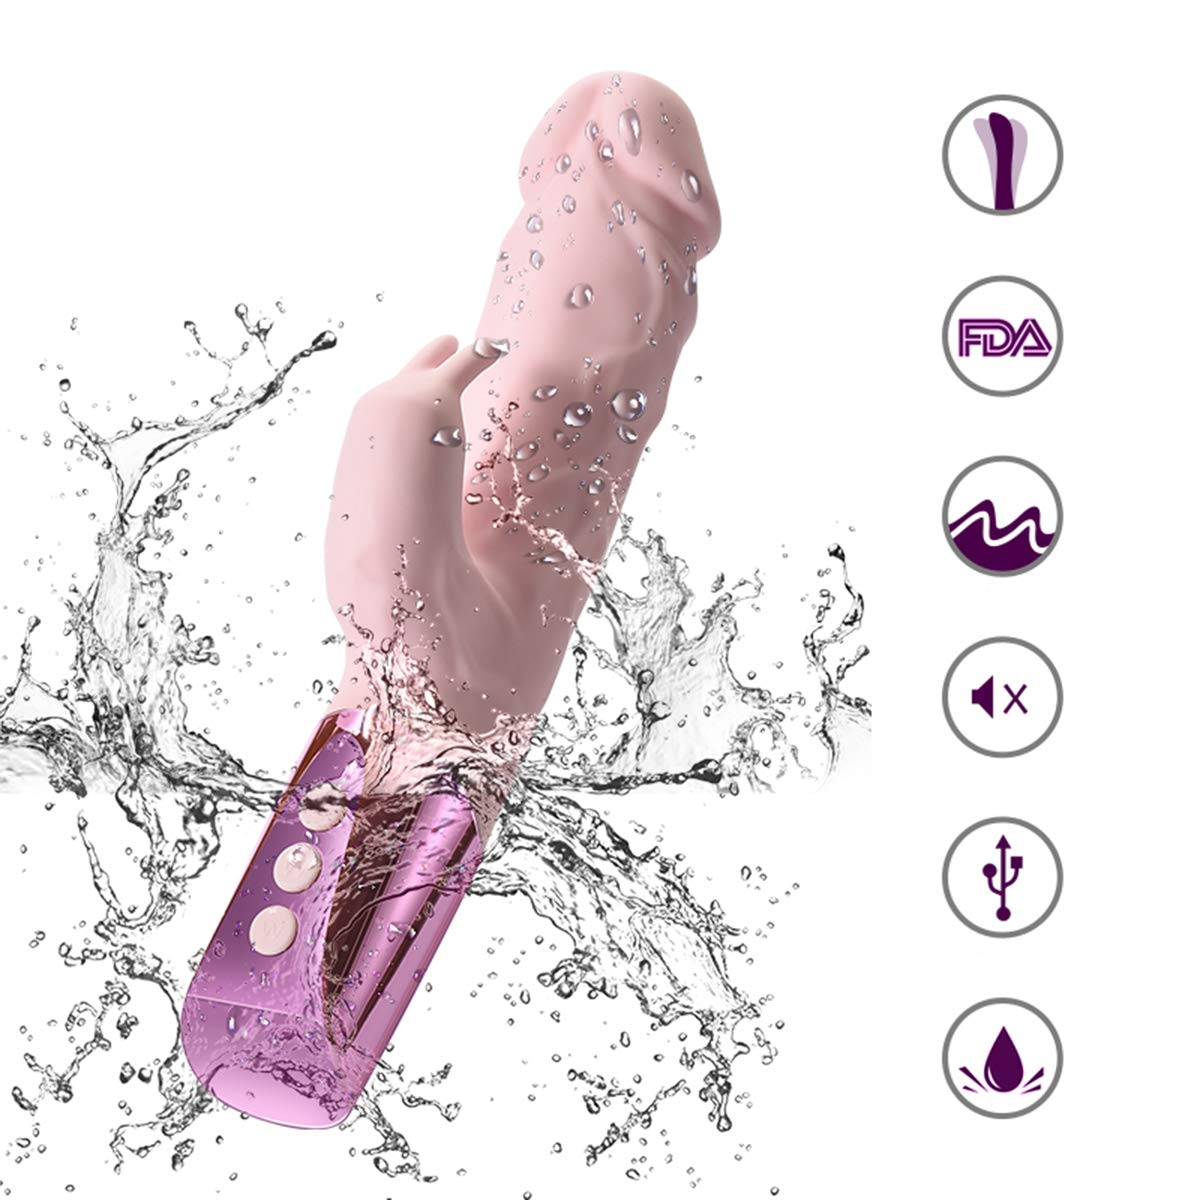 Haiya 30 Speed Large Rabbit Dildo Vibrator Dual Strong Stimulation G Spot Clit Vibrator Female Masturbator